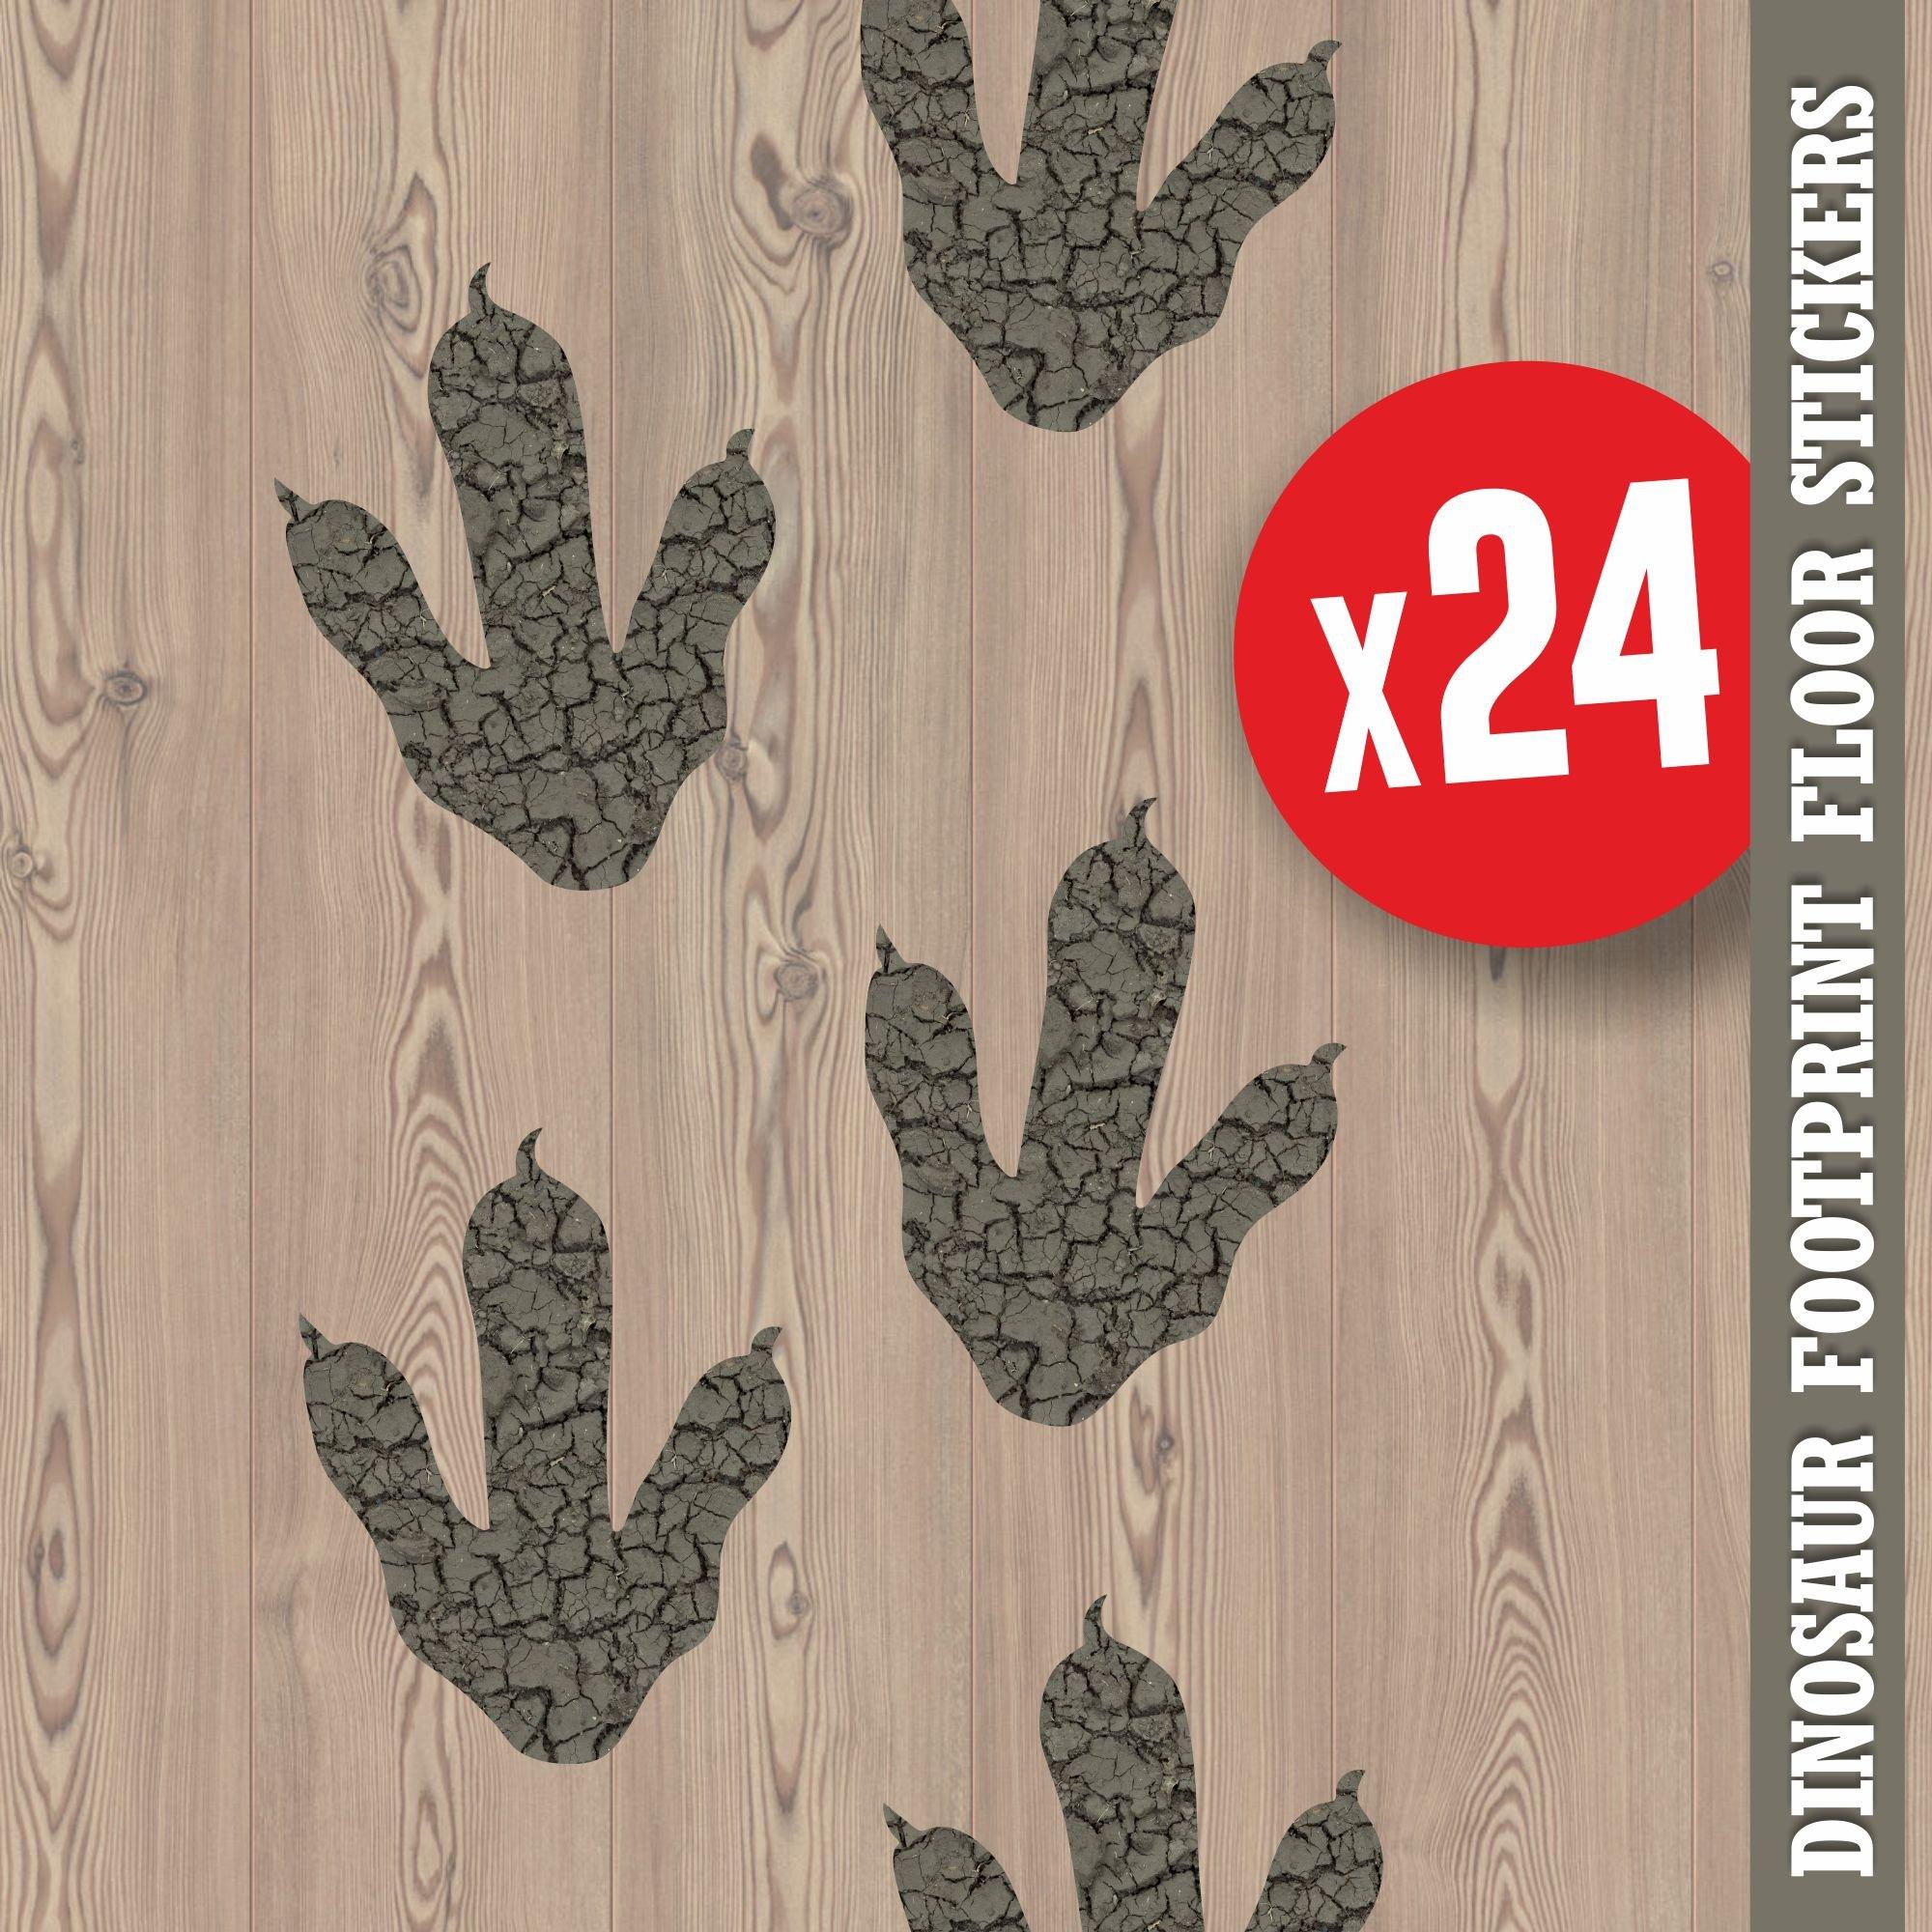 Dinosaur Footprints Prints Floor Stickers Foot Prints Jurassic World Style